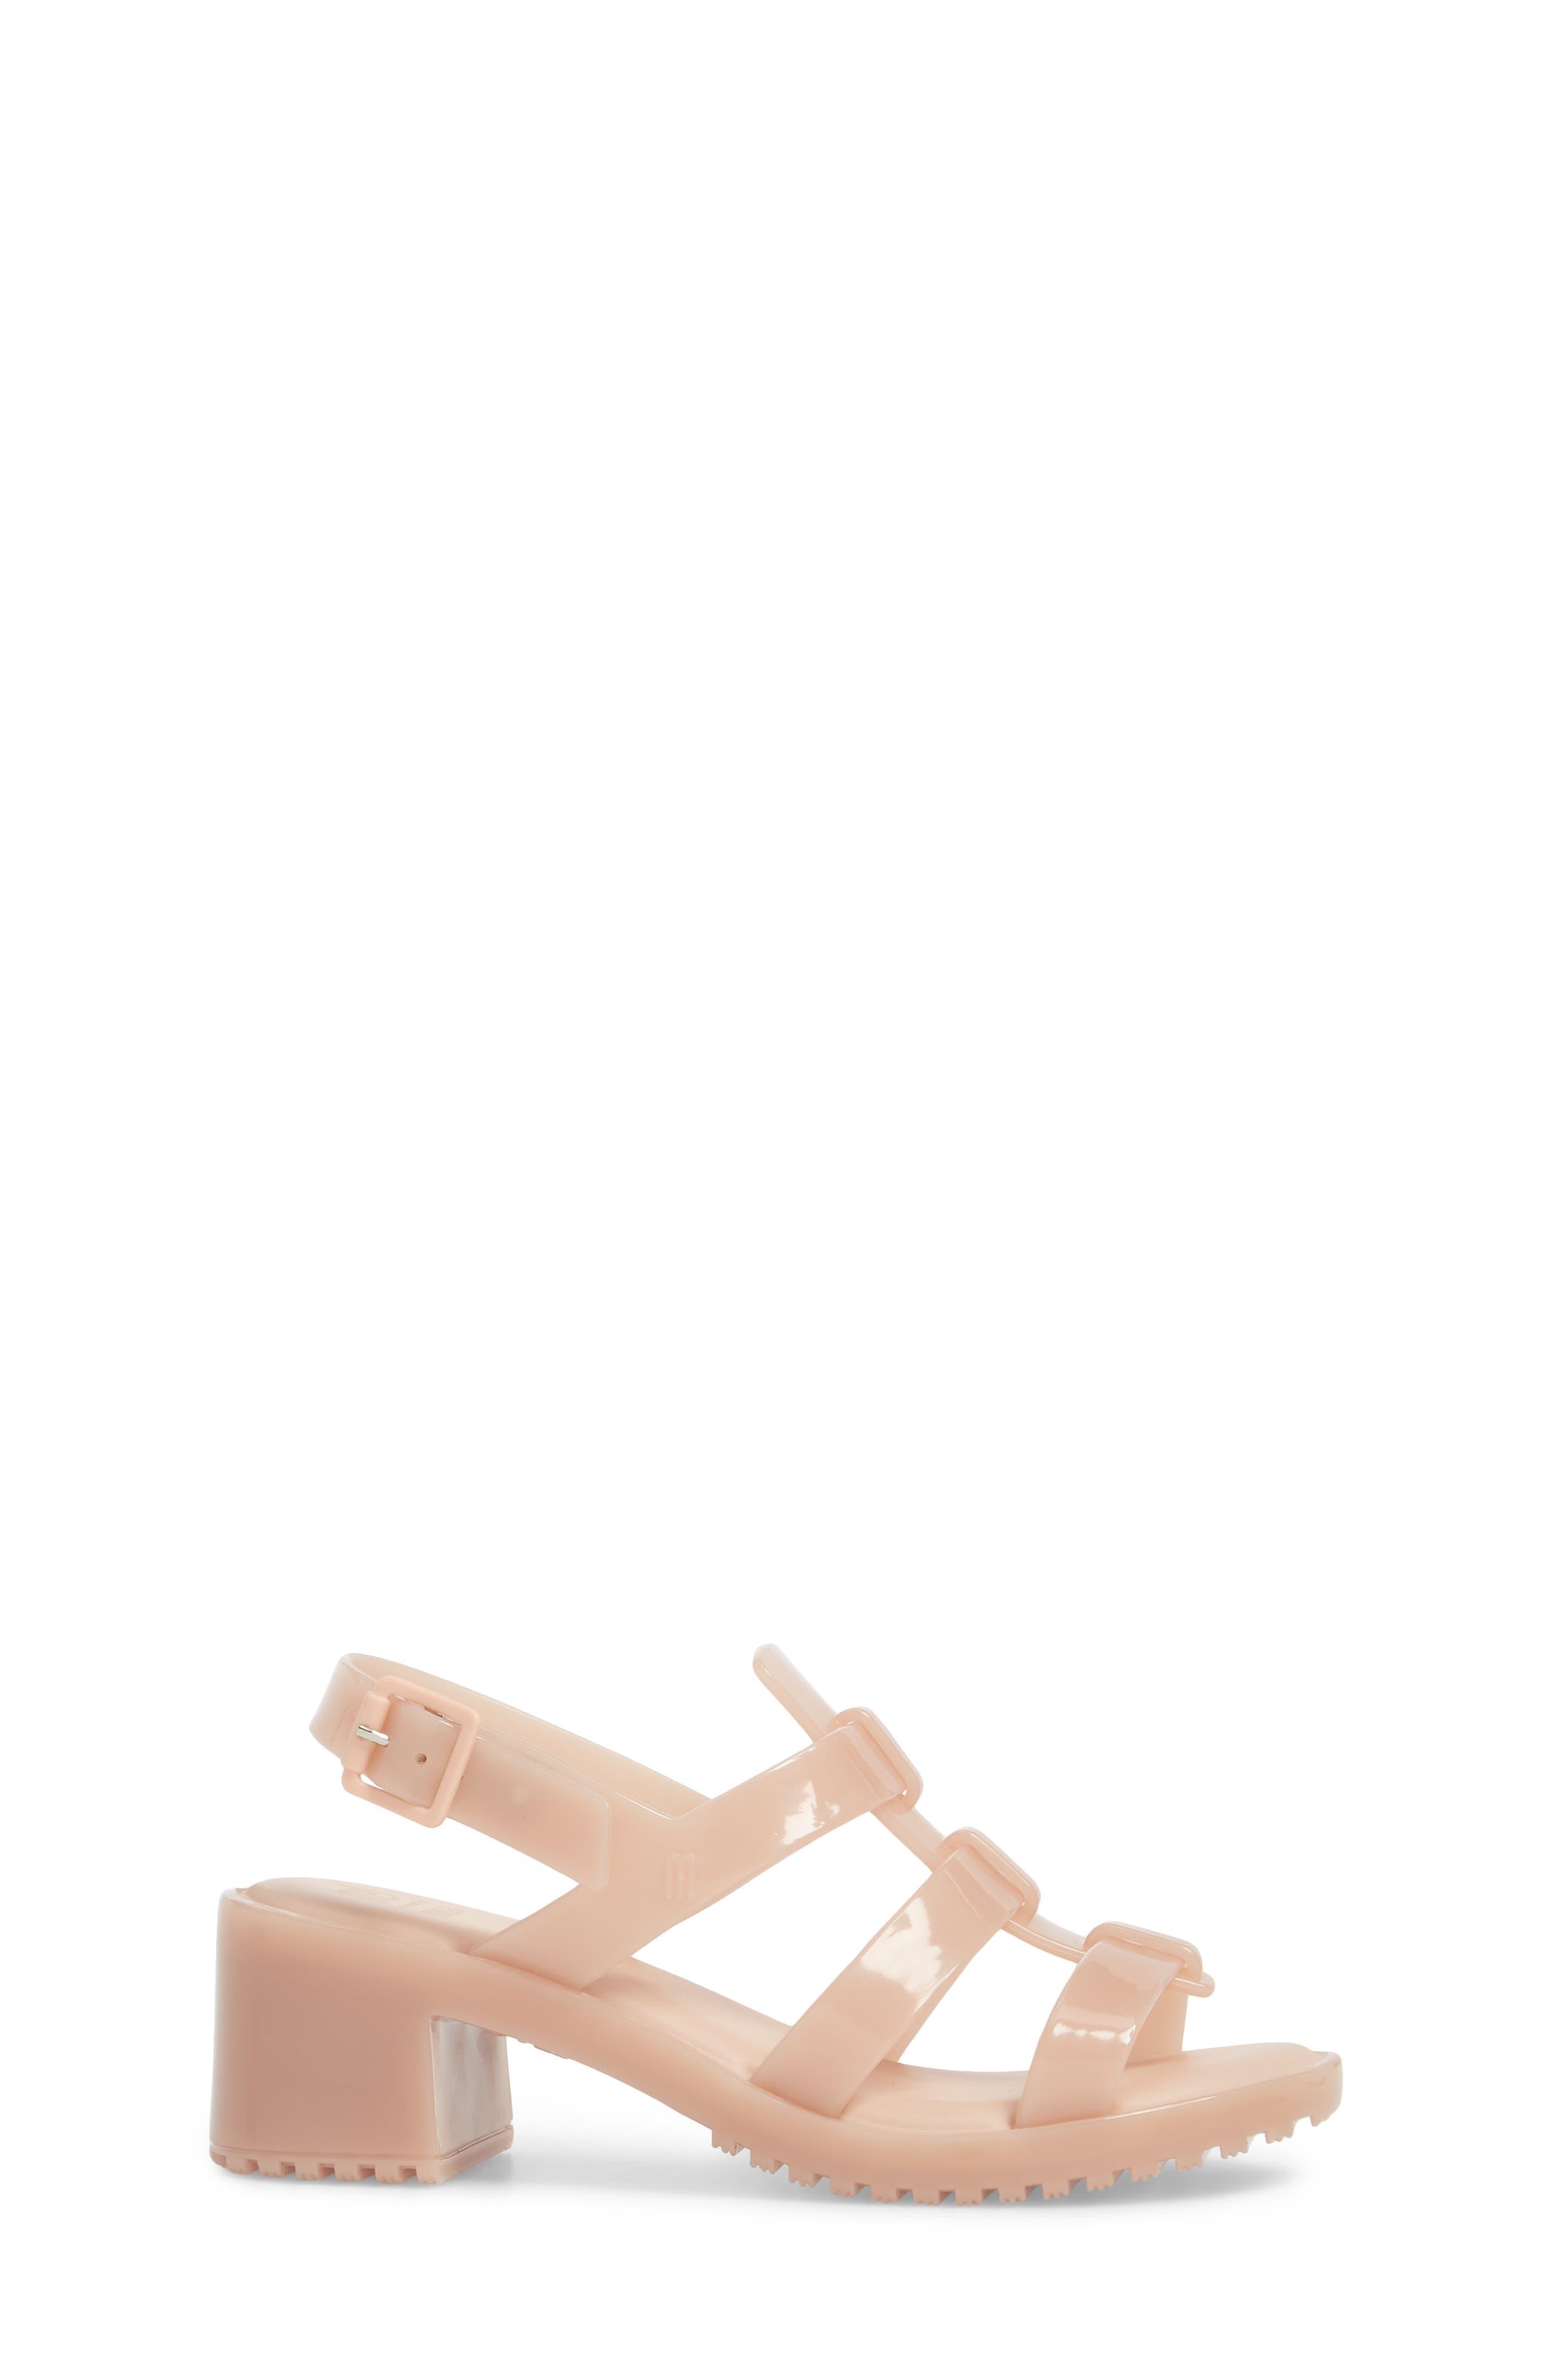 'Flox' Sandal,                             Alternate thumbnail 3, color,                             Light Pink Matte